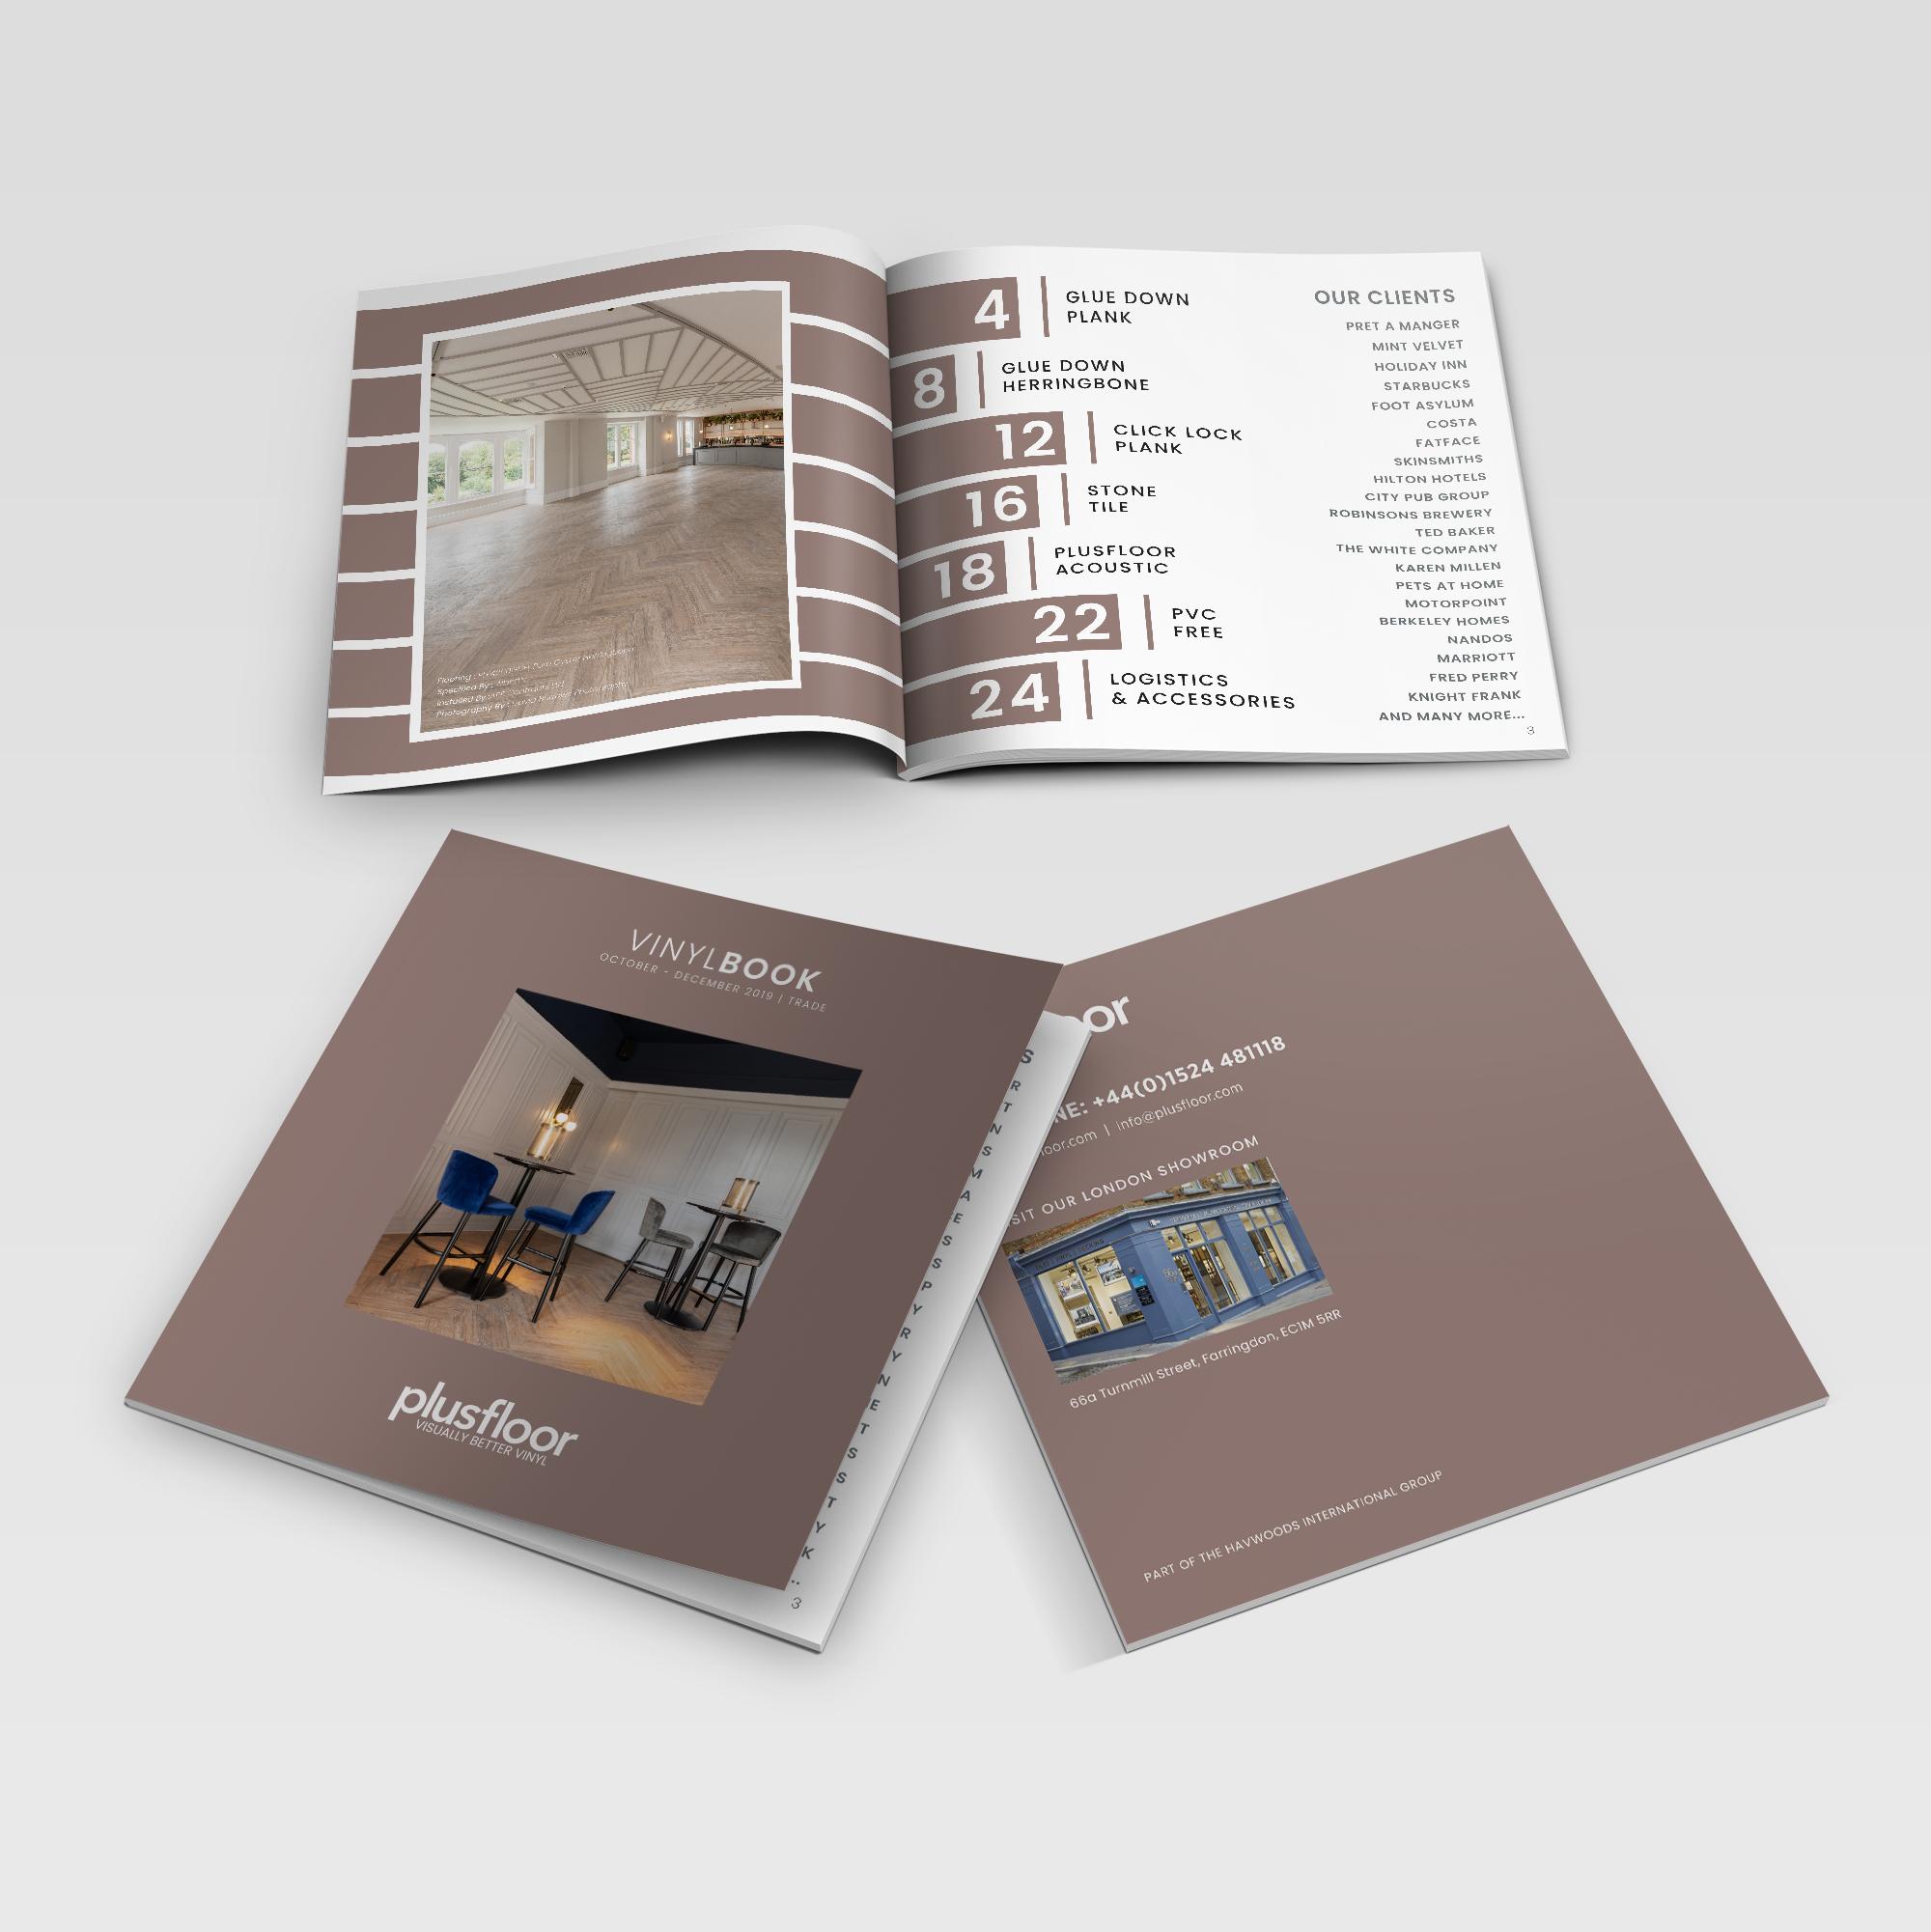 Vinyl Book.png